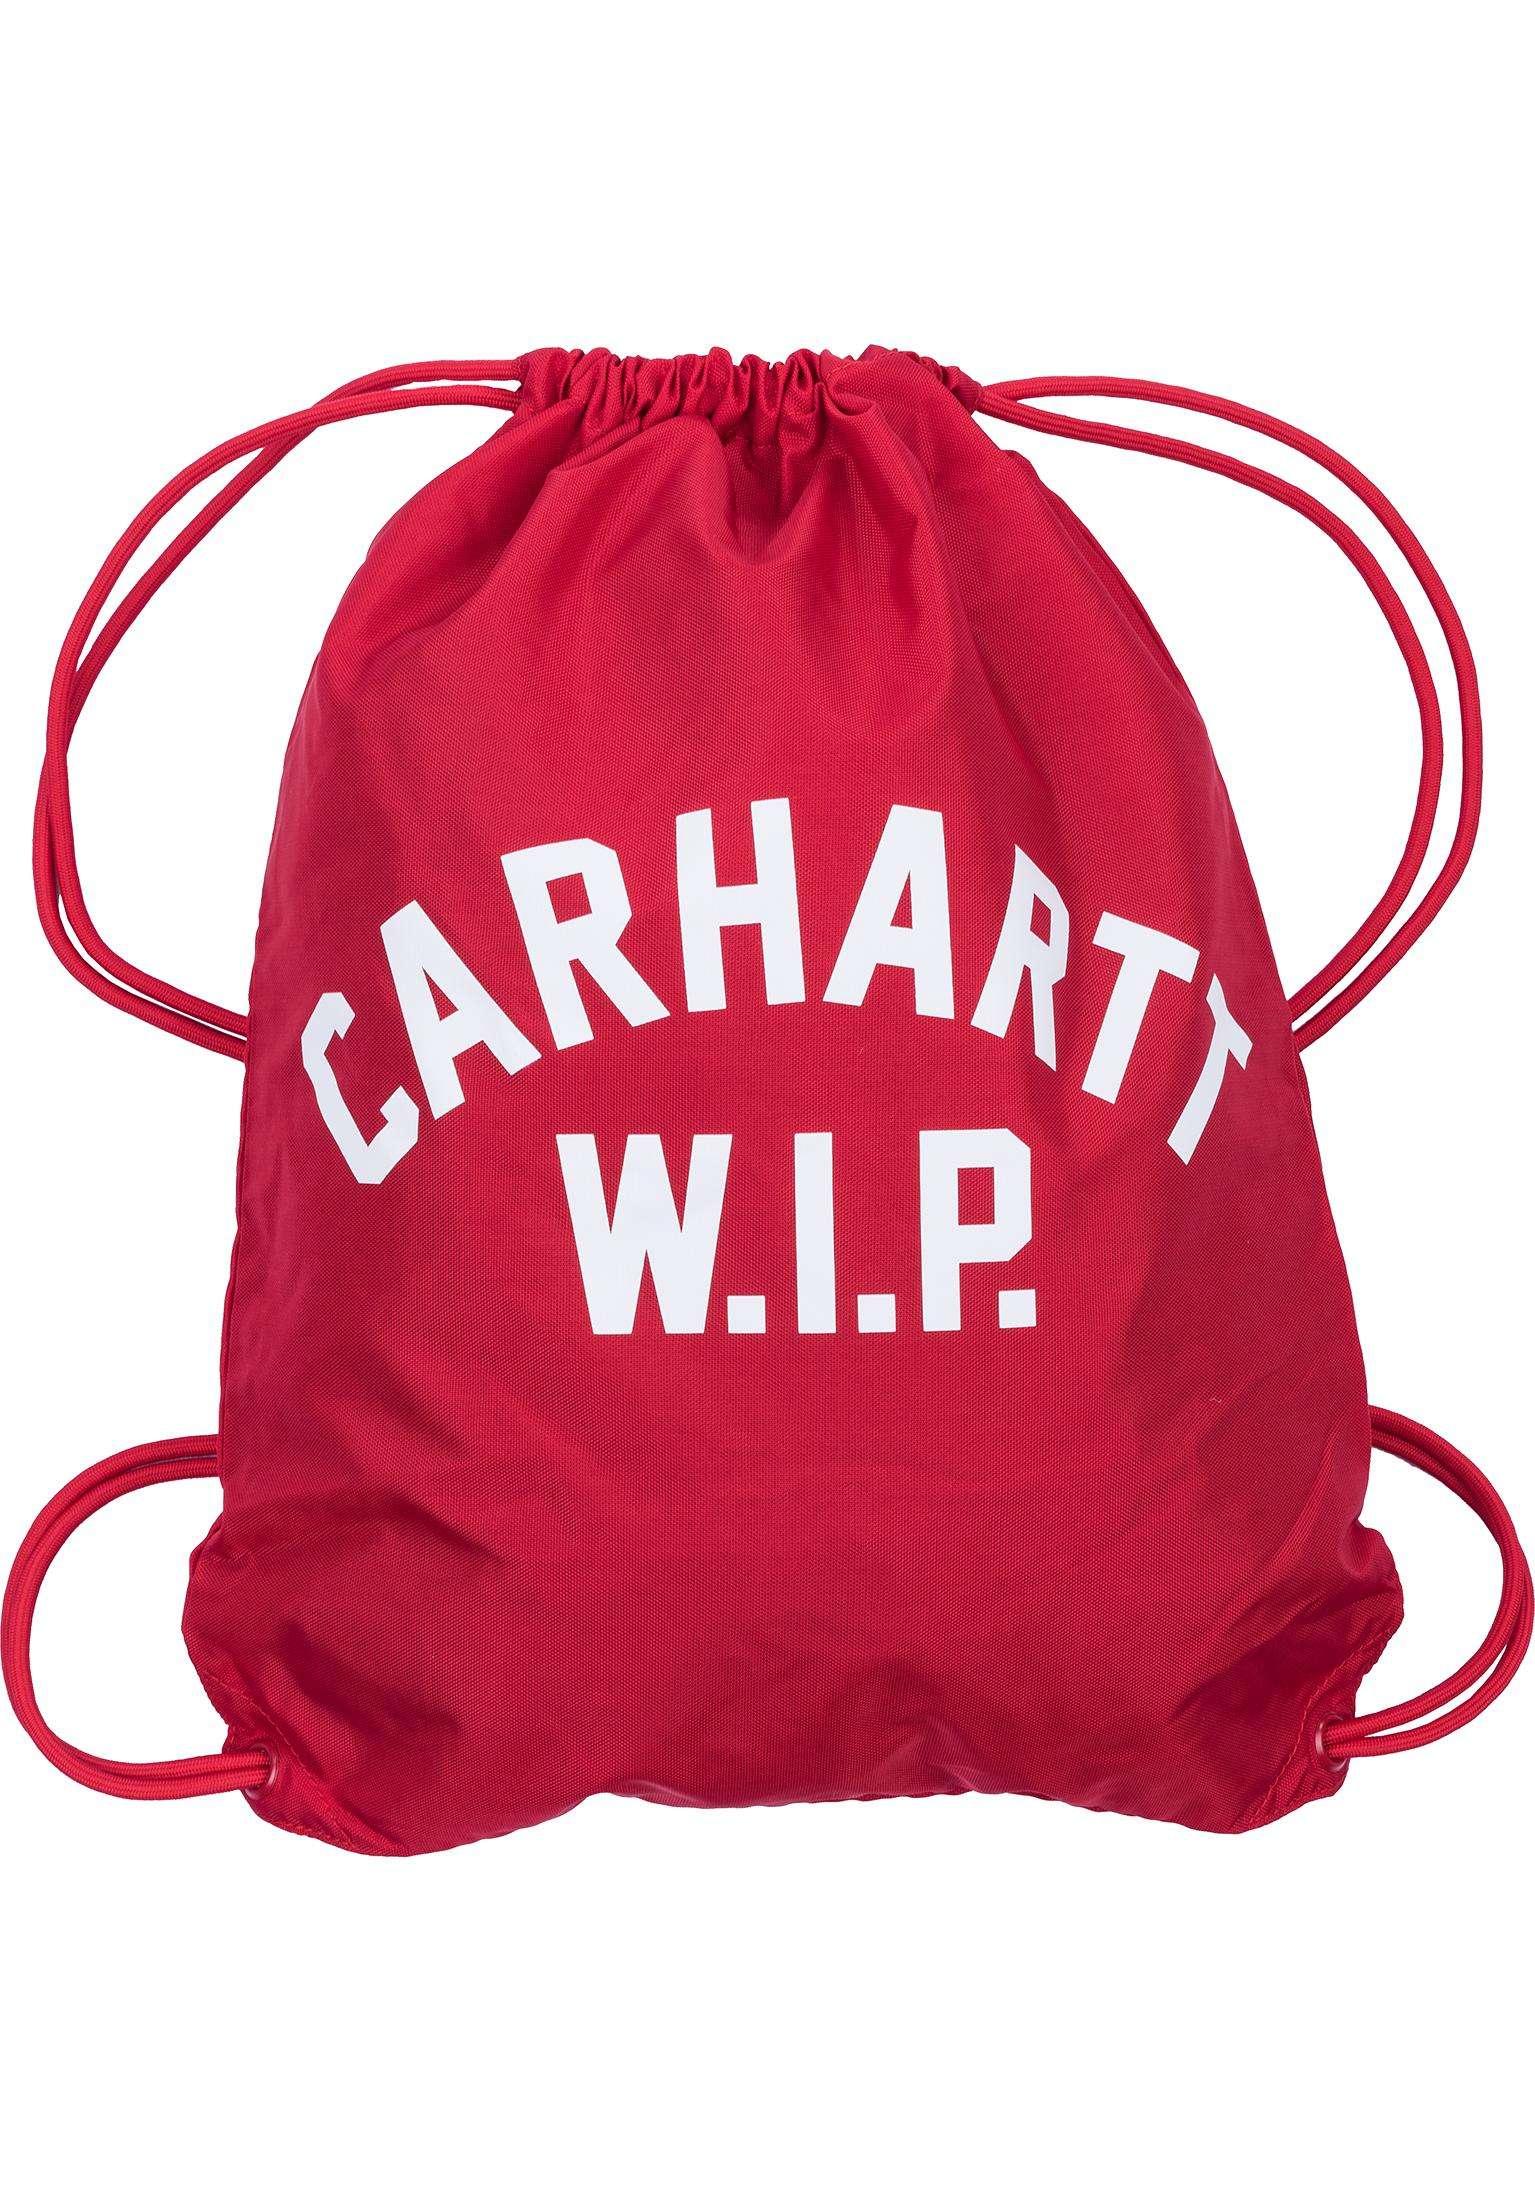 f4e9ac997482 USS Script Carhartt WIP Bags in rosehip-white for Men